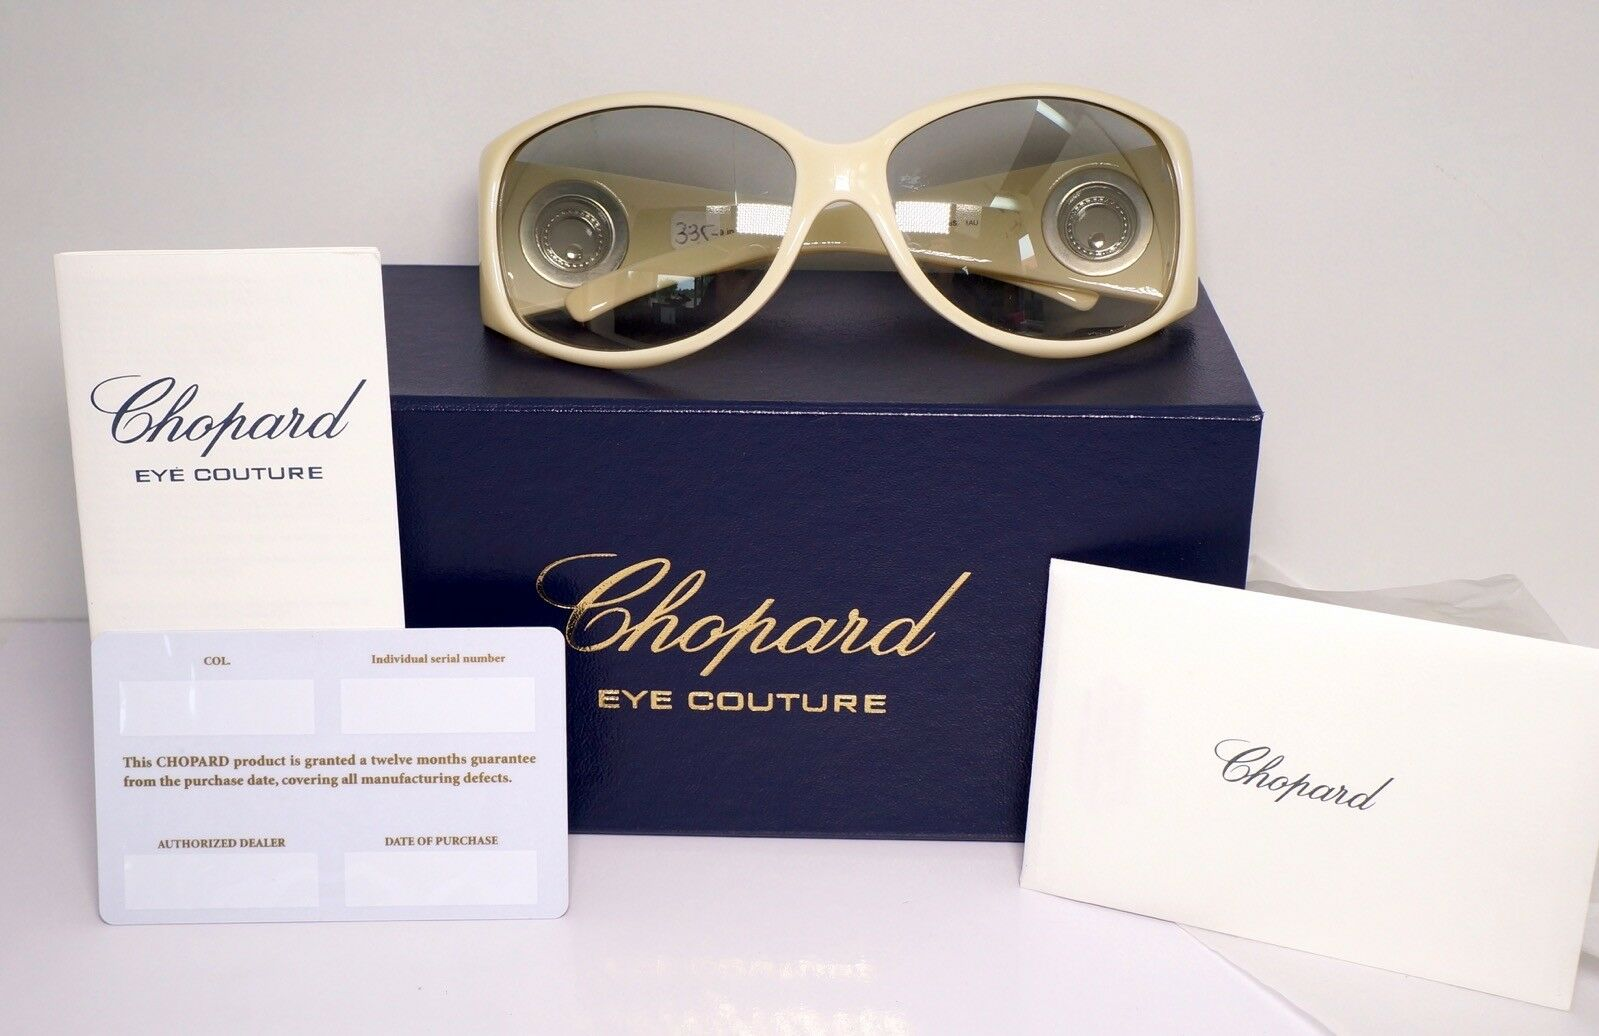 [-50%] PvP 335 Chopard Geneve SCH 008S 1AU sunglasses gafas sol sole lujo